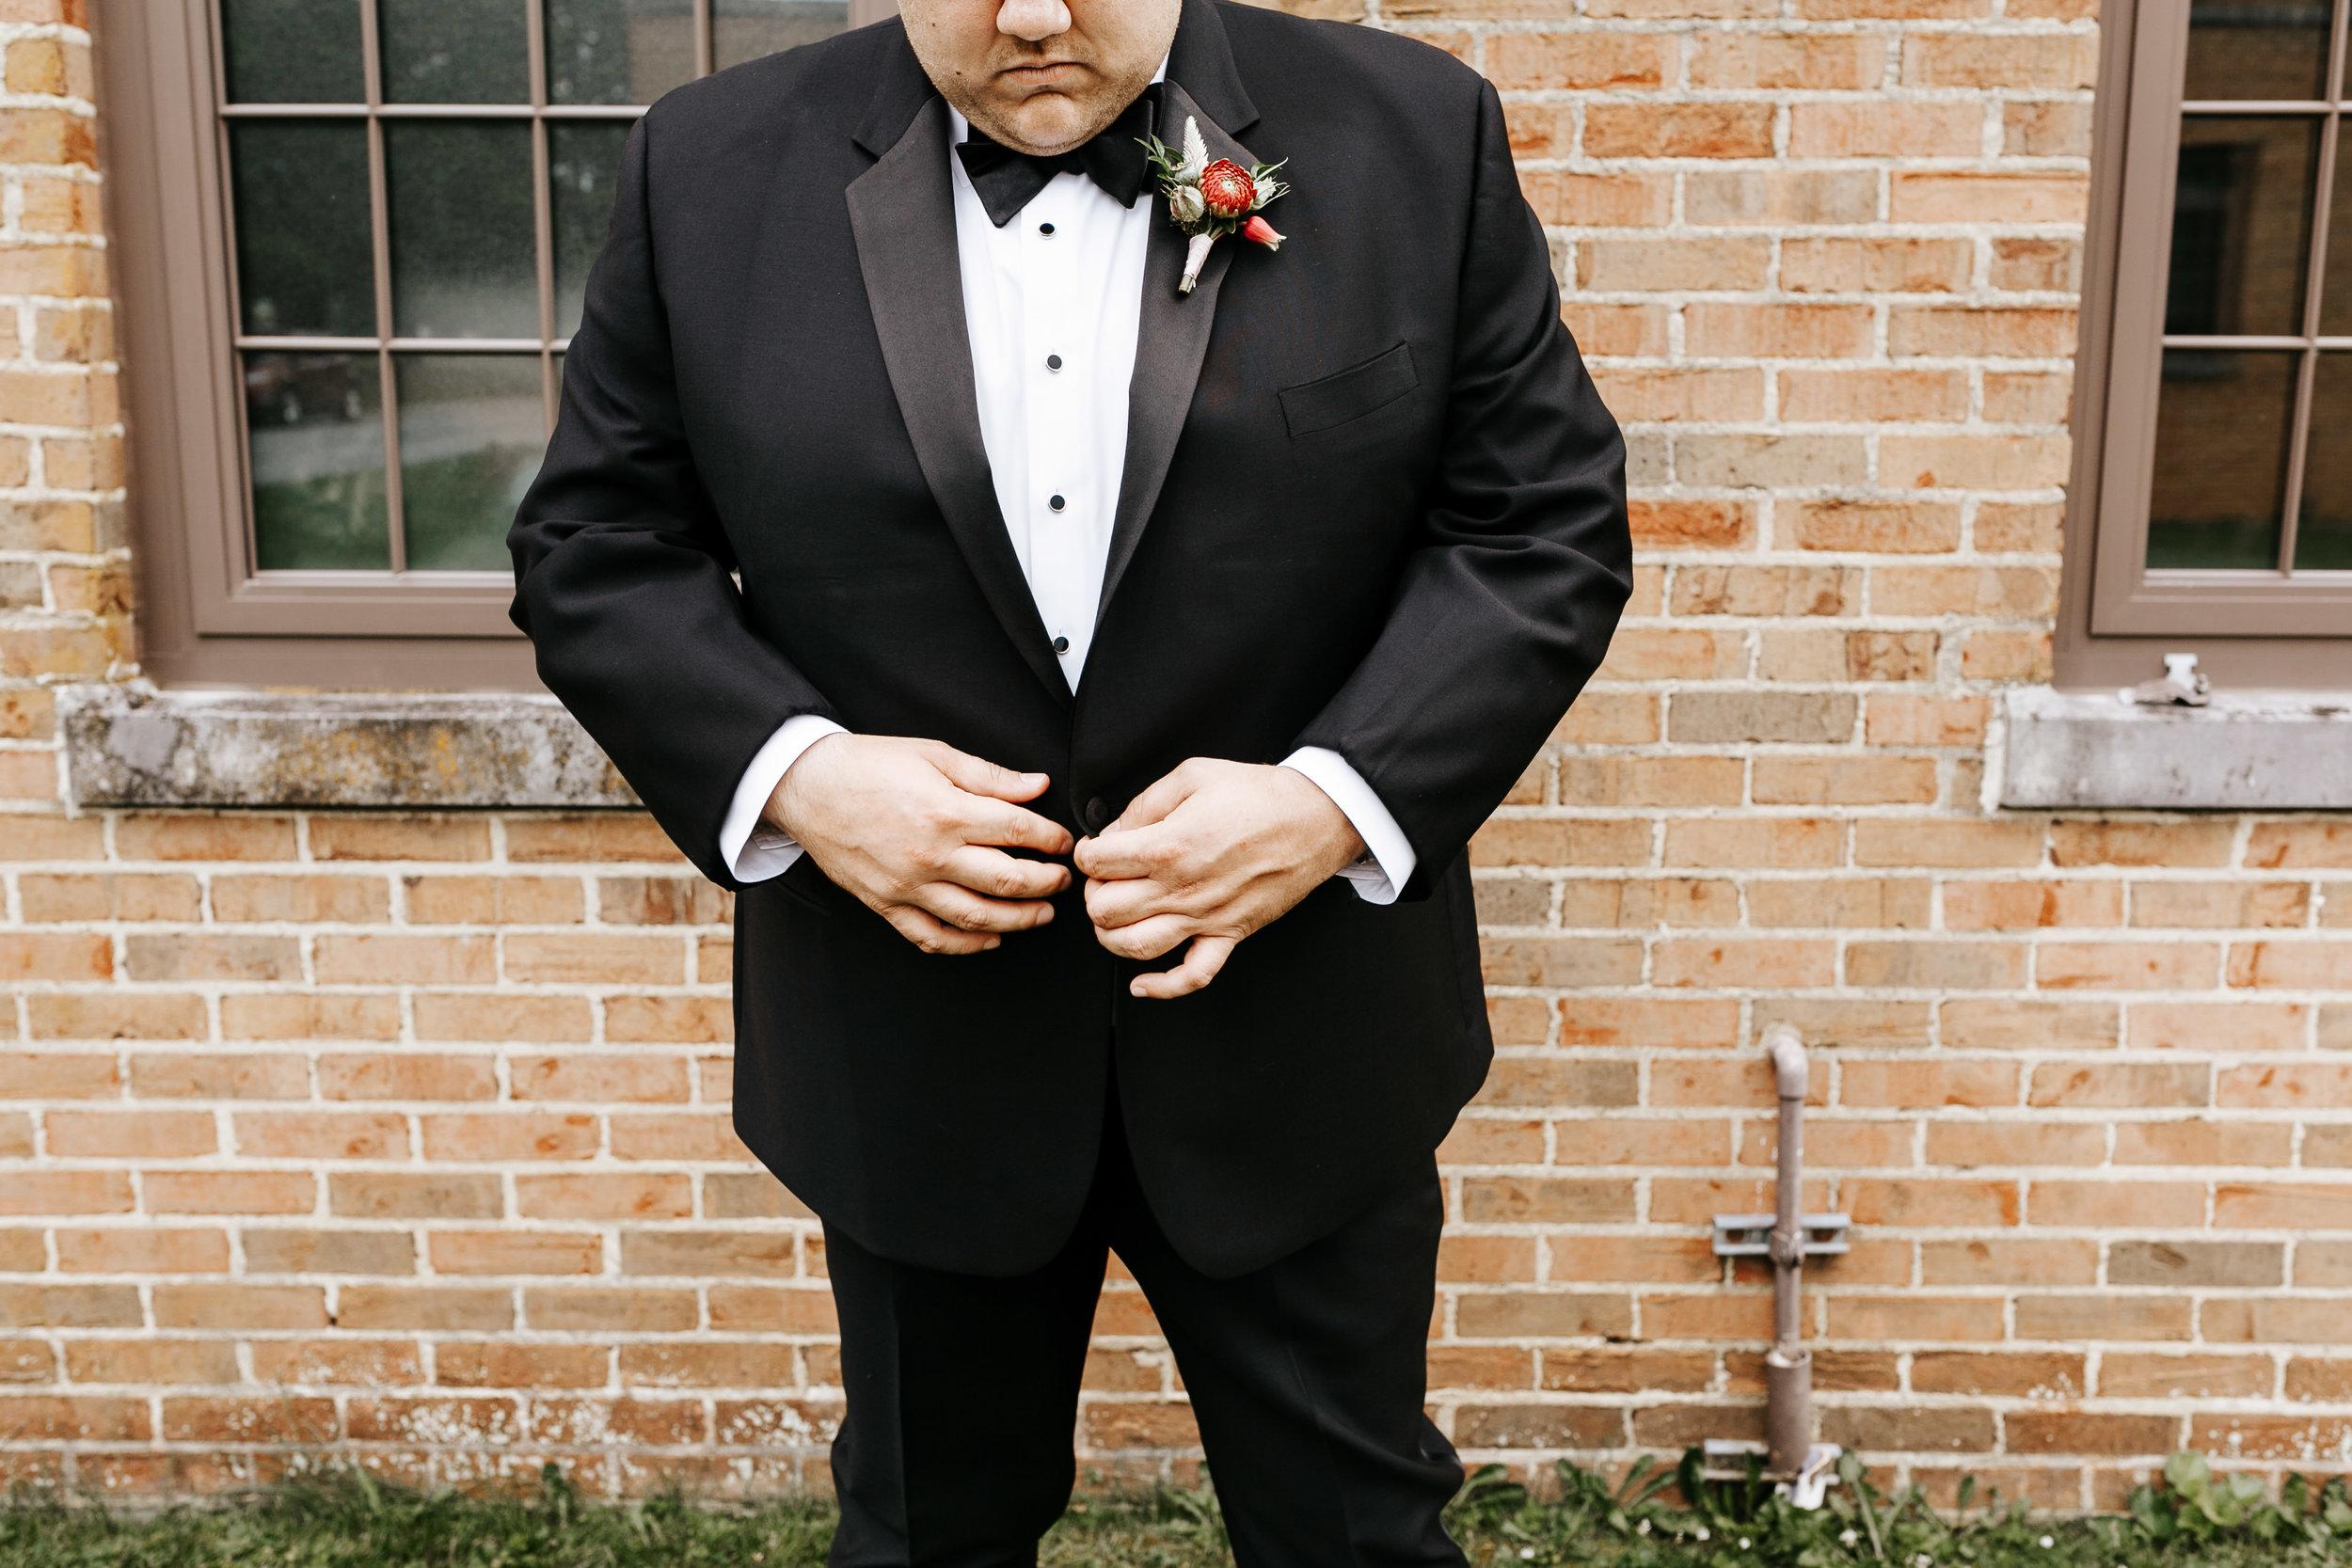 bohemian-photographer-wedding-tennessee-21.jpg